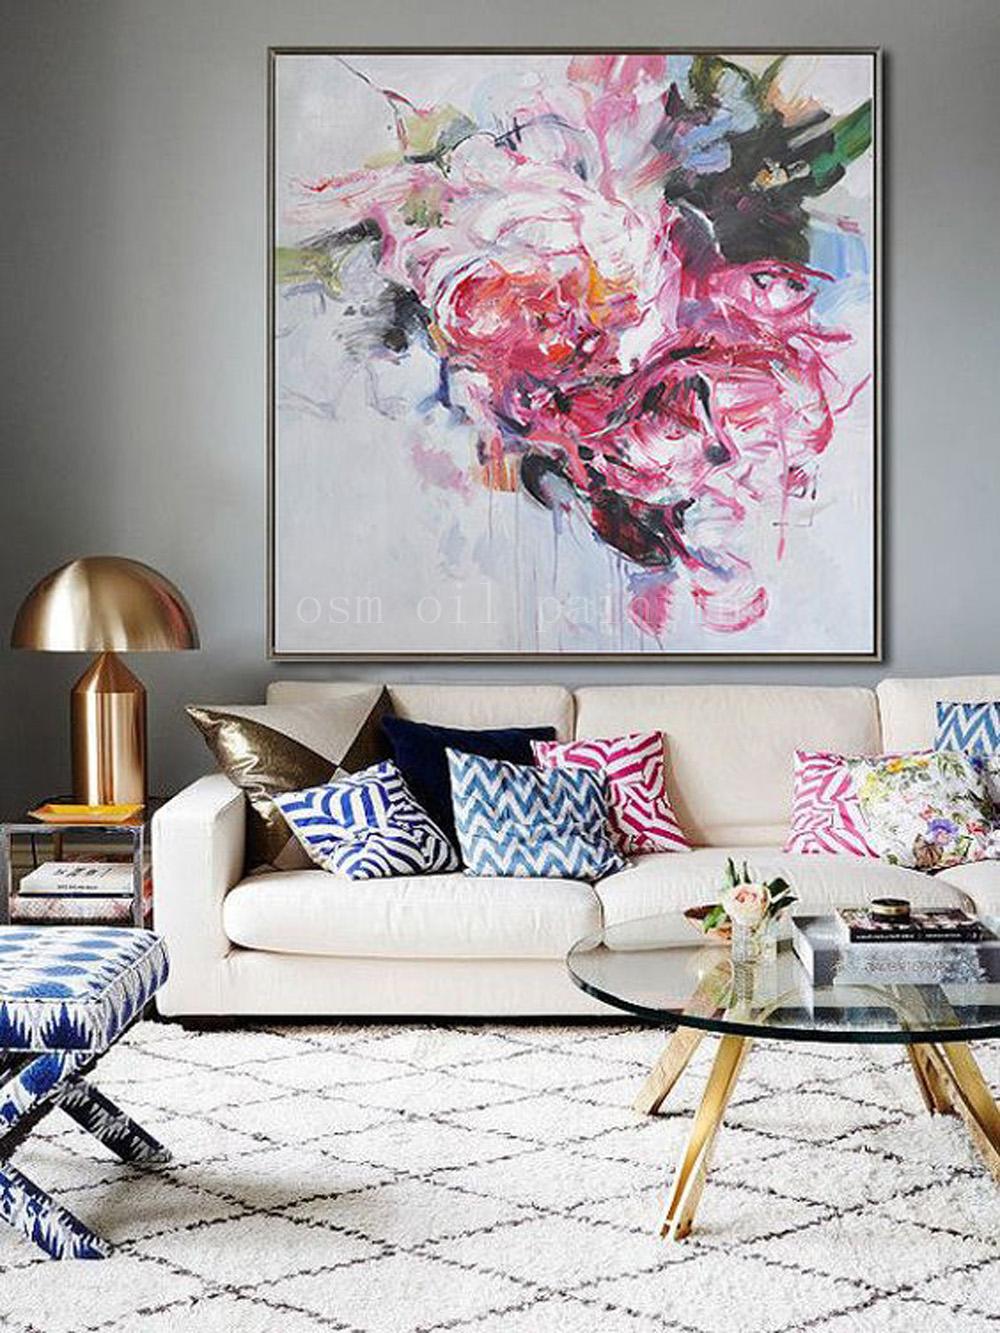 100-Tangan-Dicat-Abstrak-Colorful-Flower-Oil-Painting-On-Canvas-Handmade-Wall-Art-Impresionis-Landscape-Dekoratif